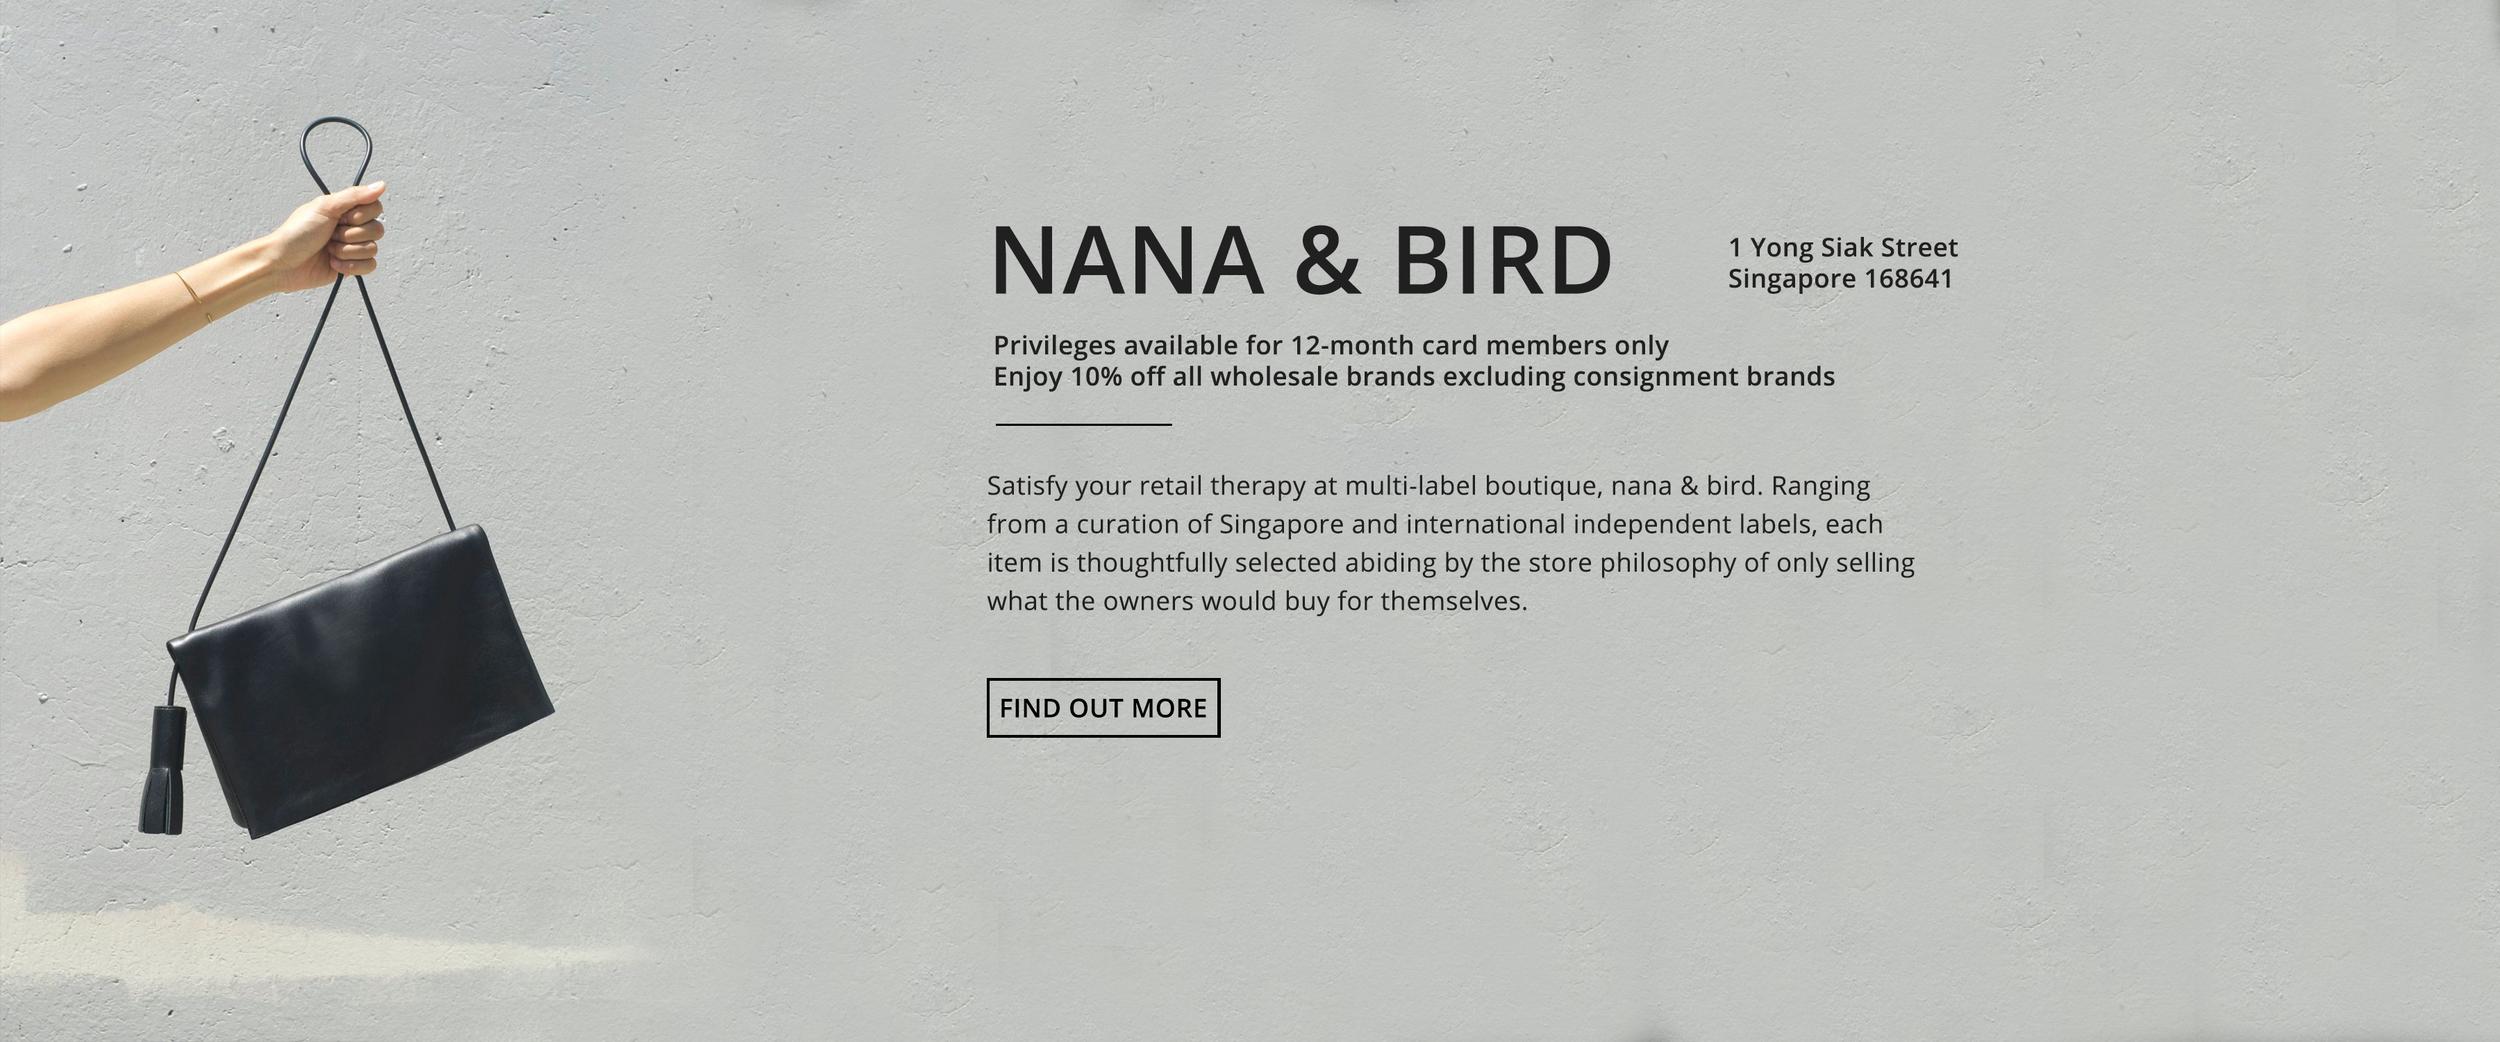 Nana & Bird.png